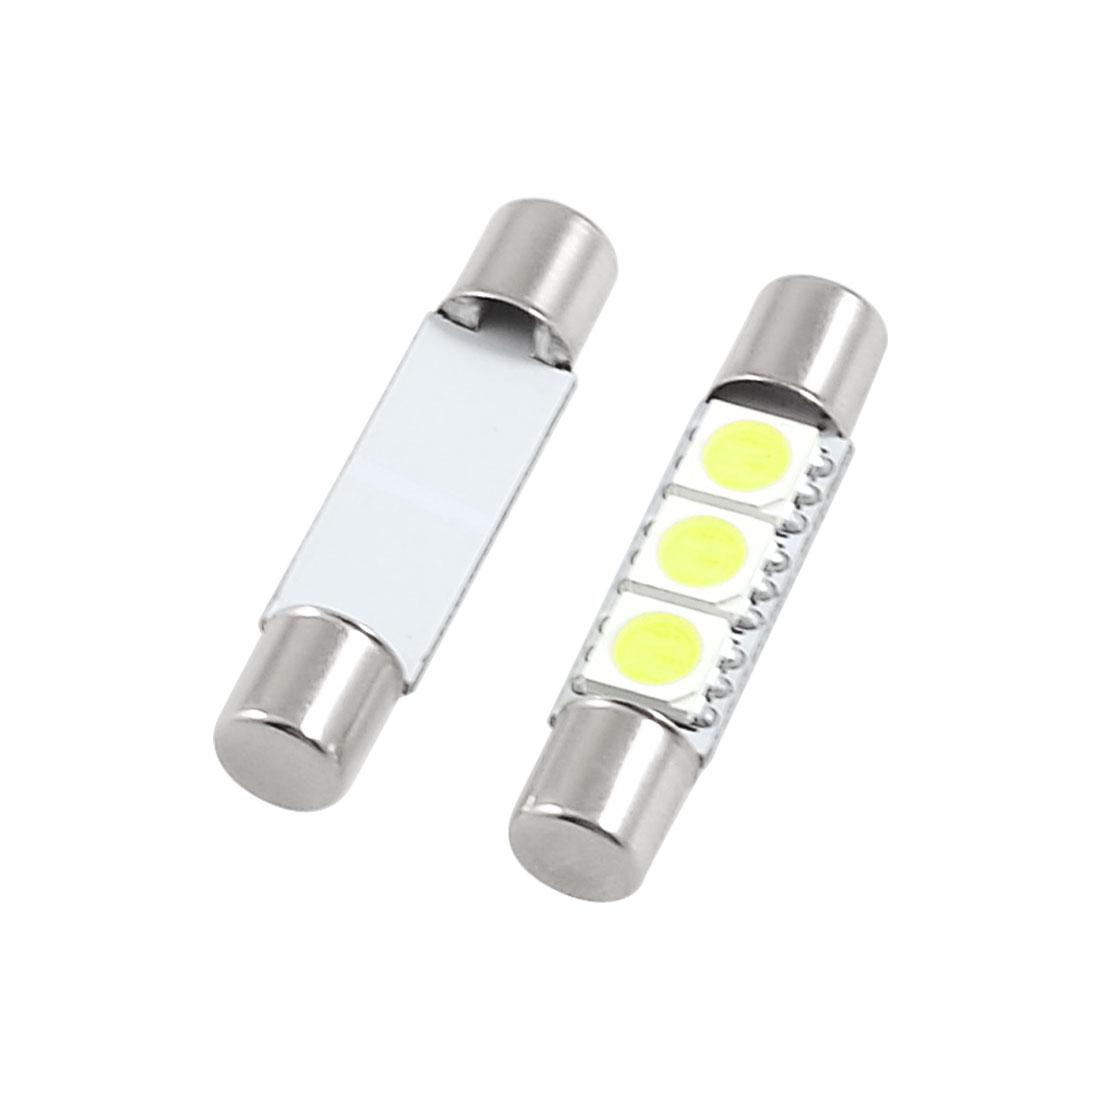 2 Pcs Car Flat Head Canbus Error Free 31mm 3 5050 SMD LED Dome Lights